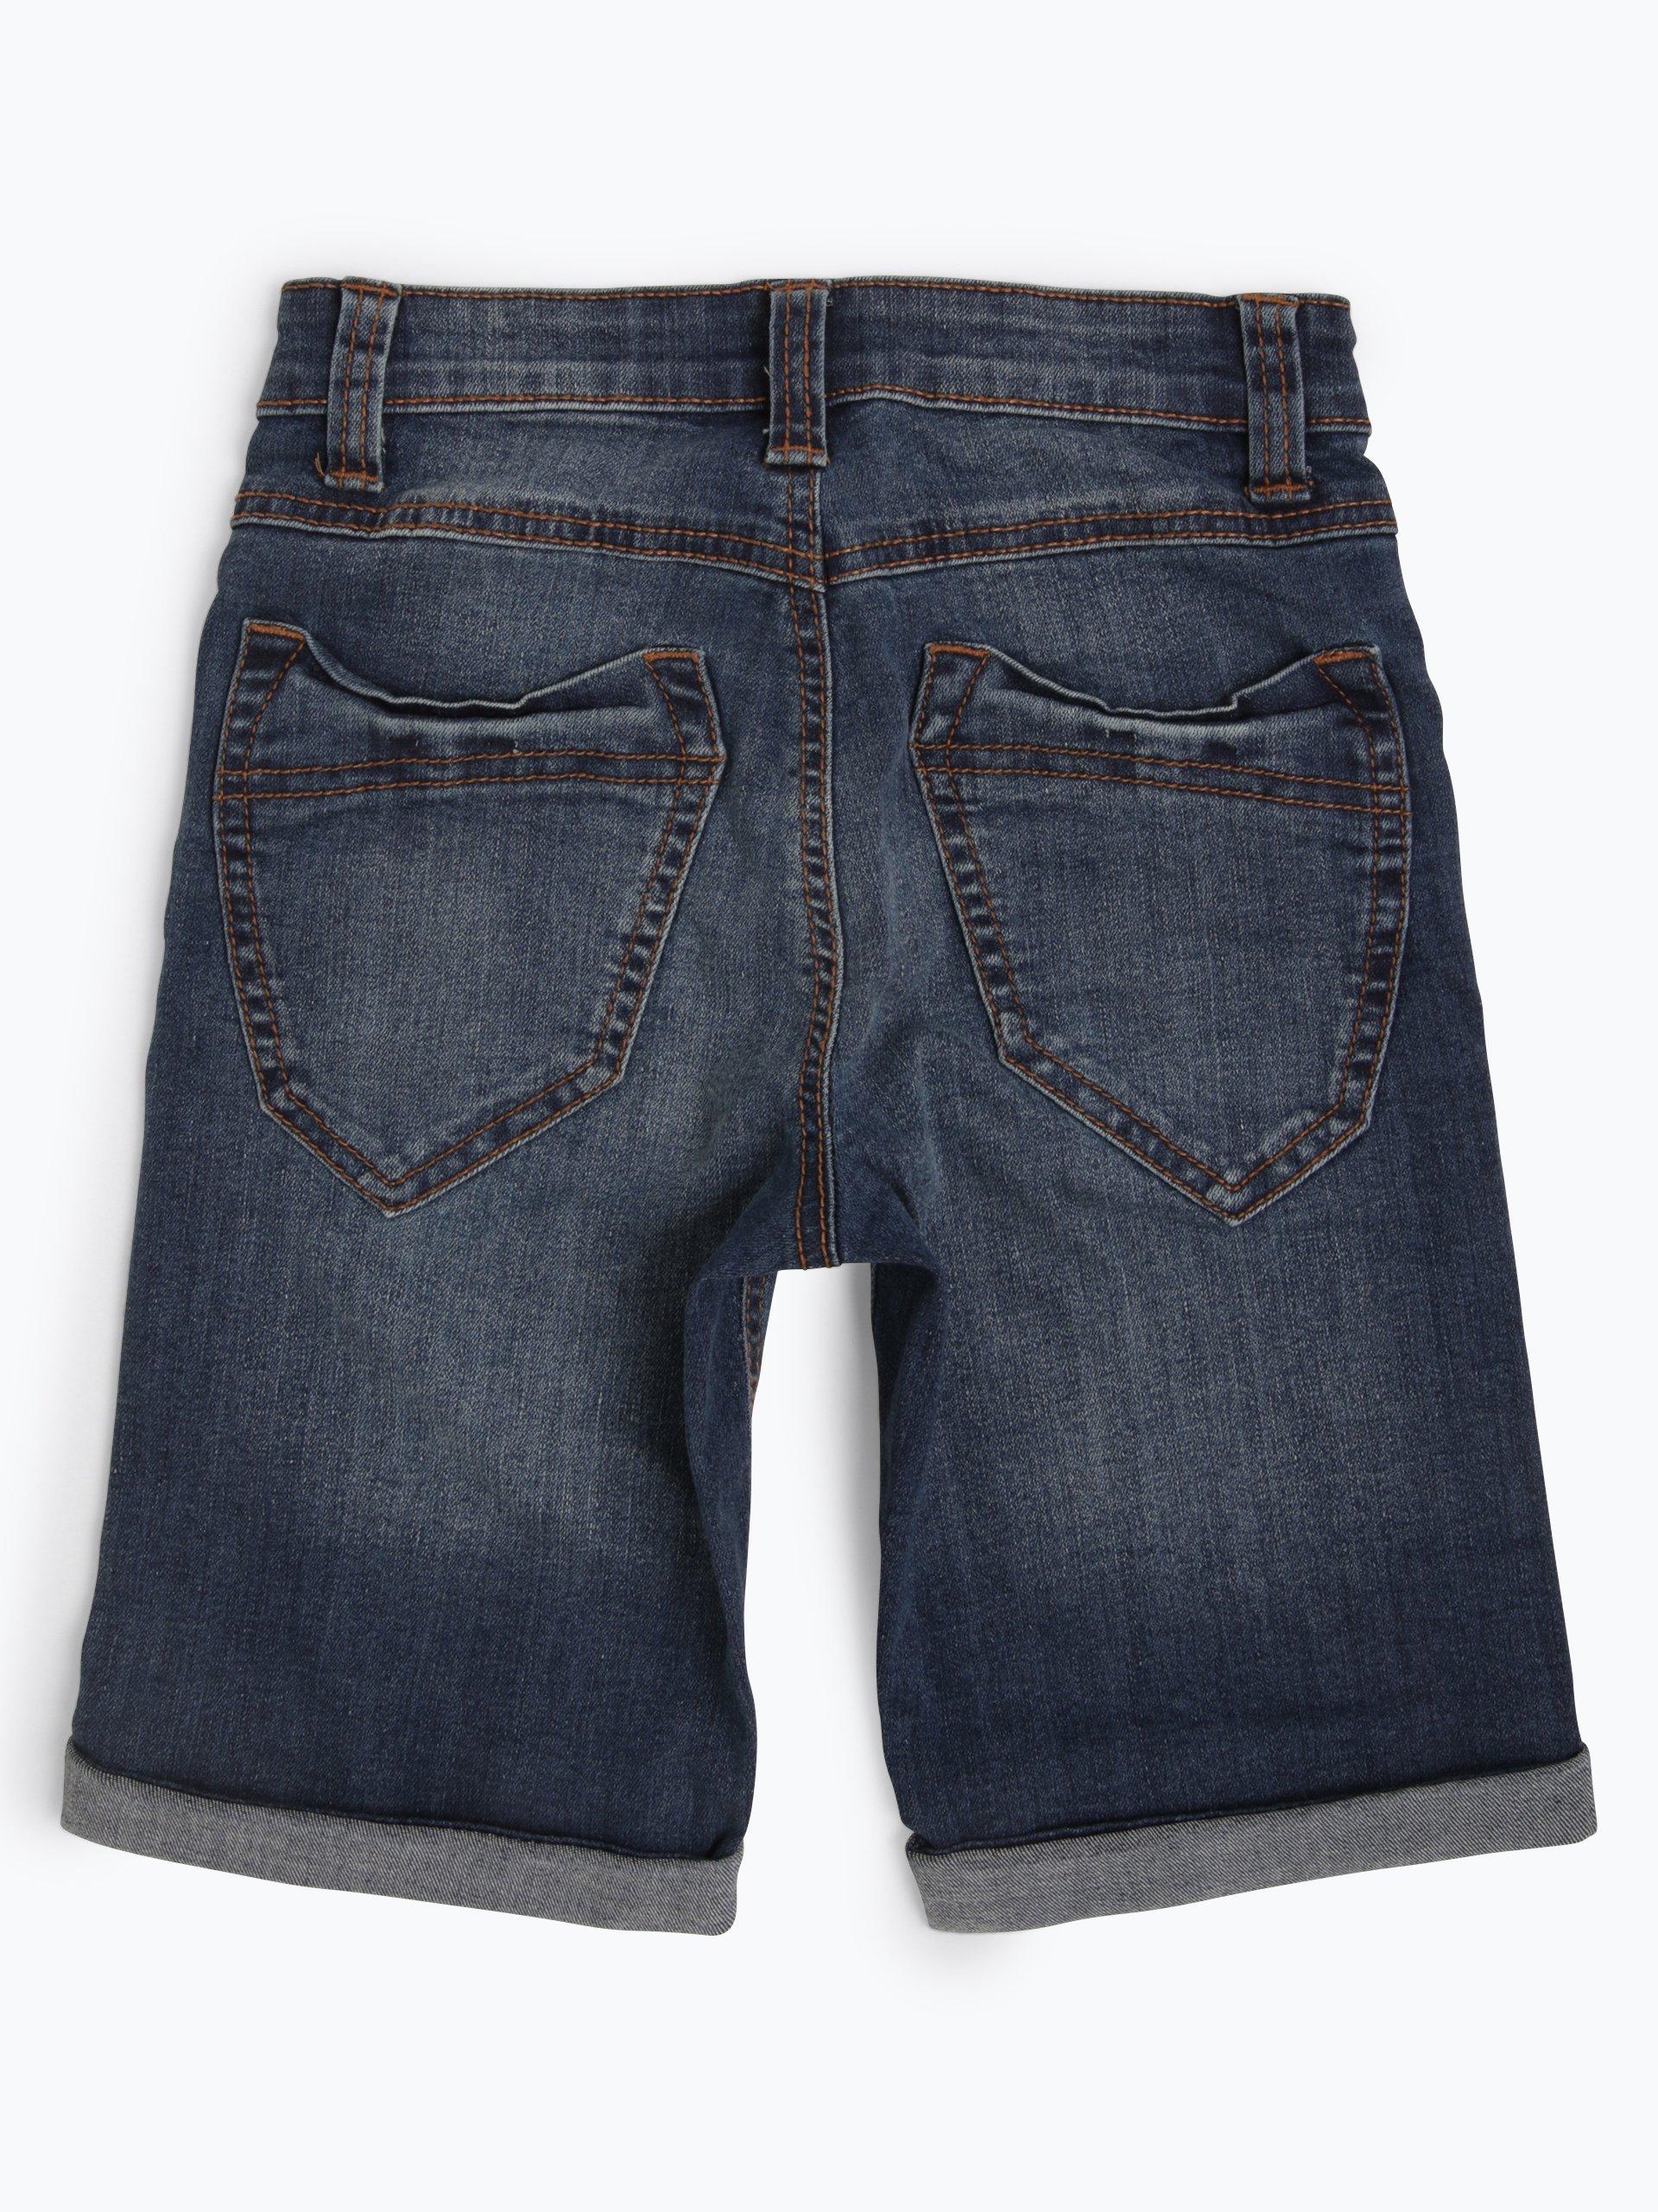 s.Oliver Casual Jungen Jeansshorts Slim Fit